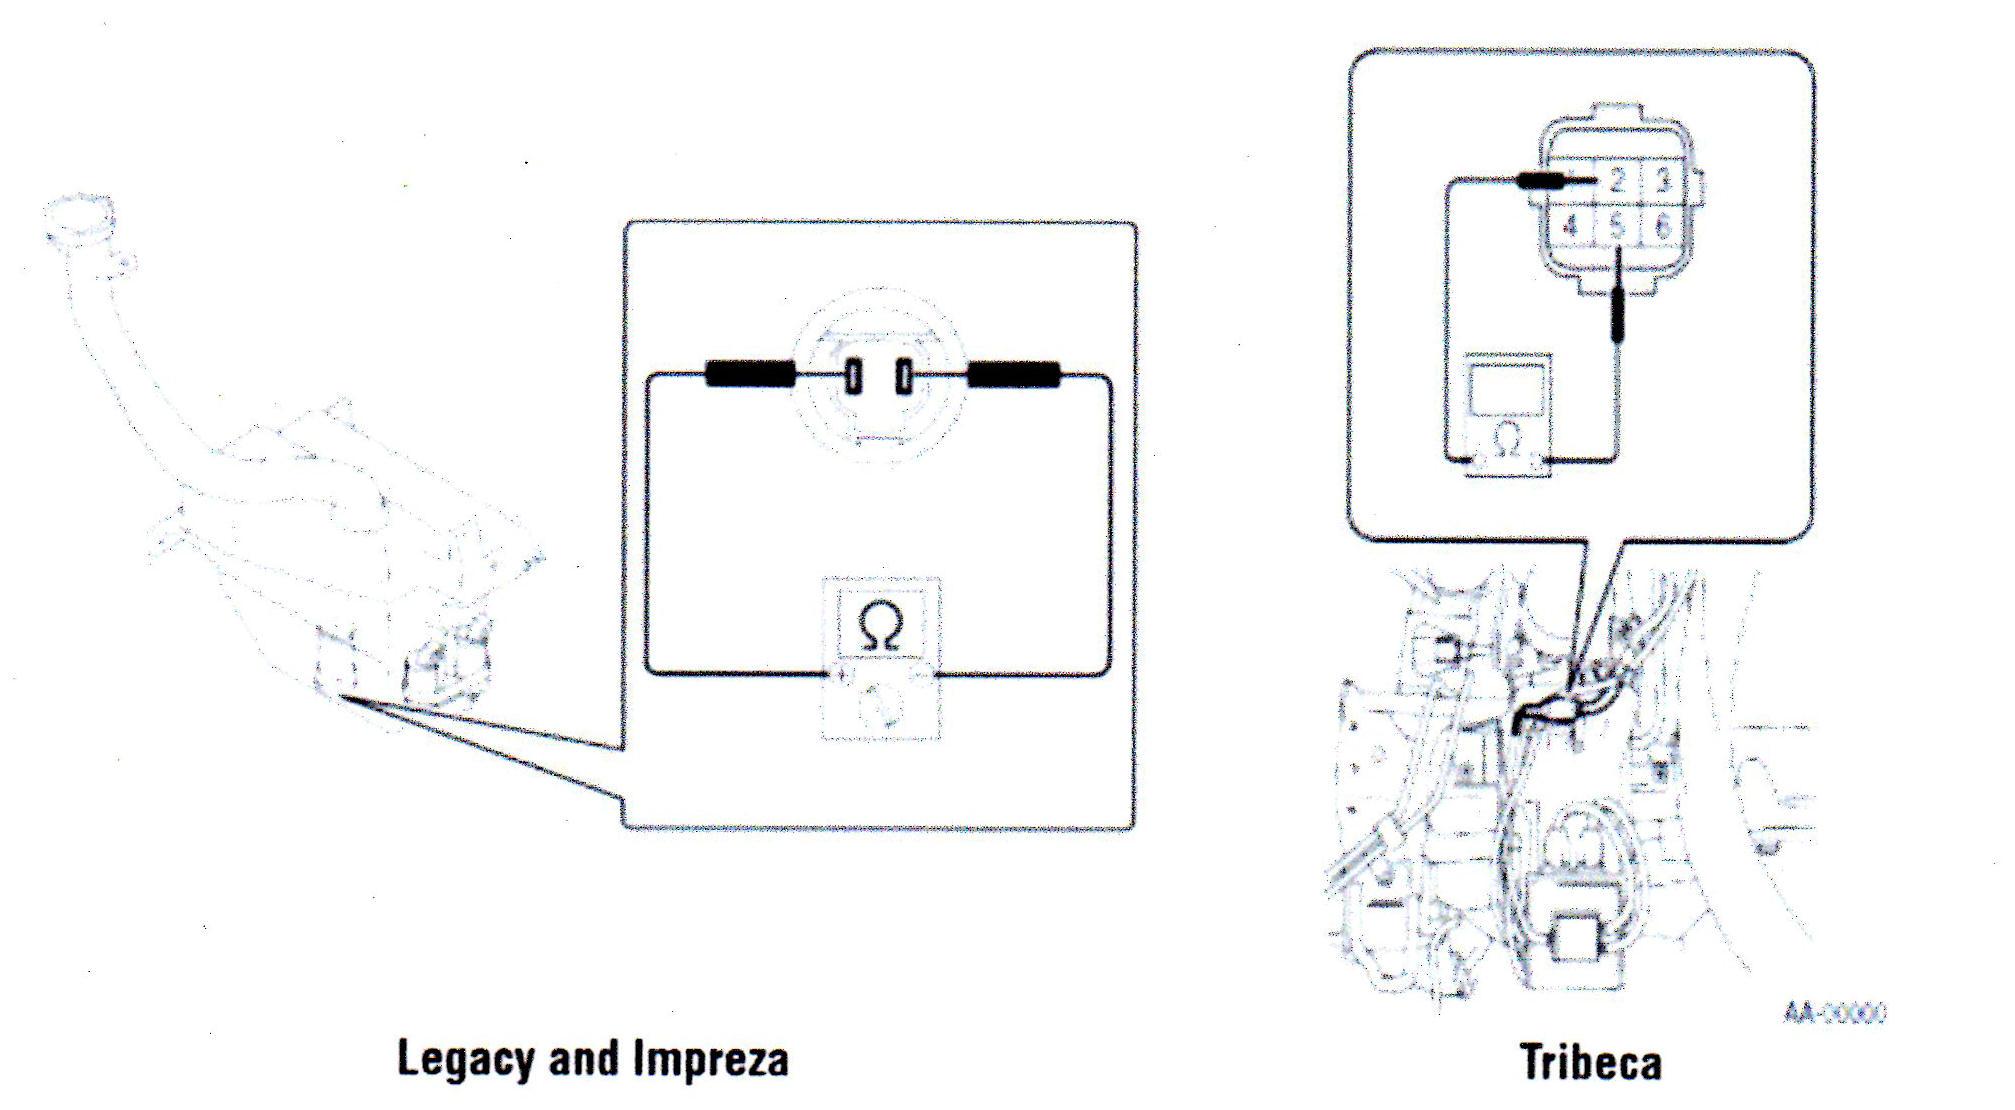 Subaru washer level sensor